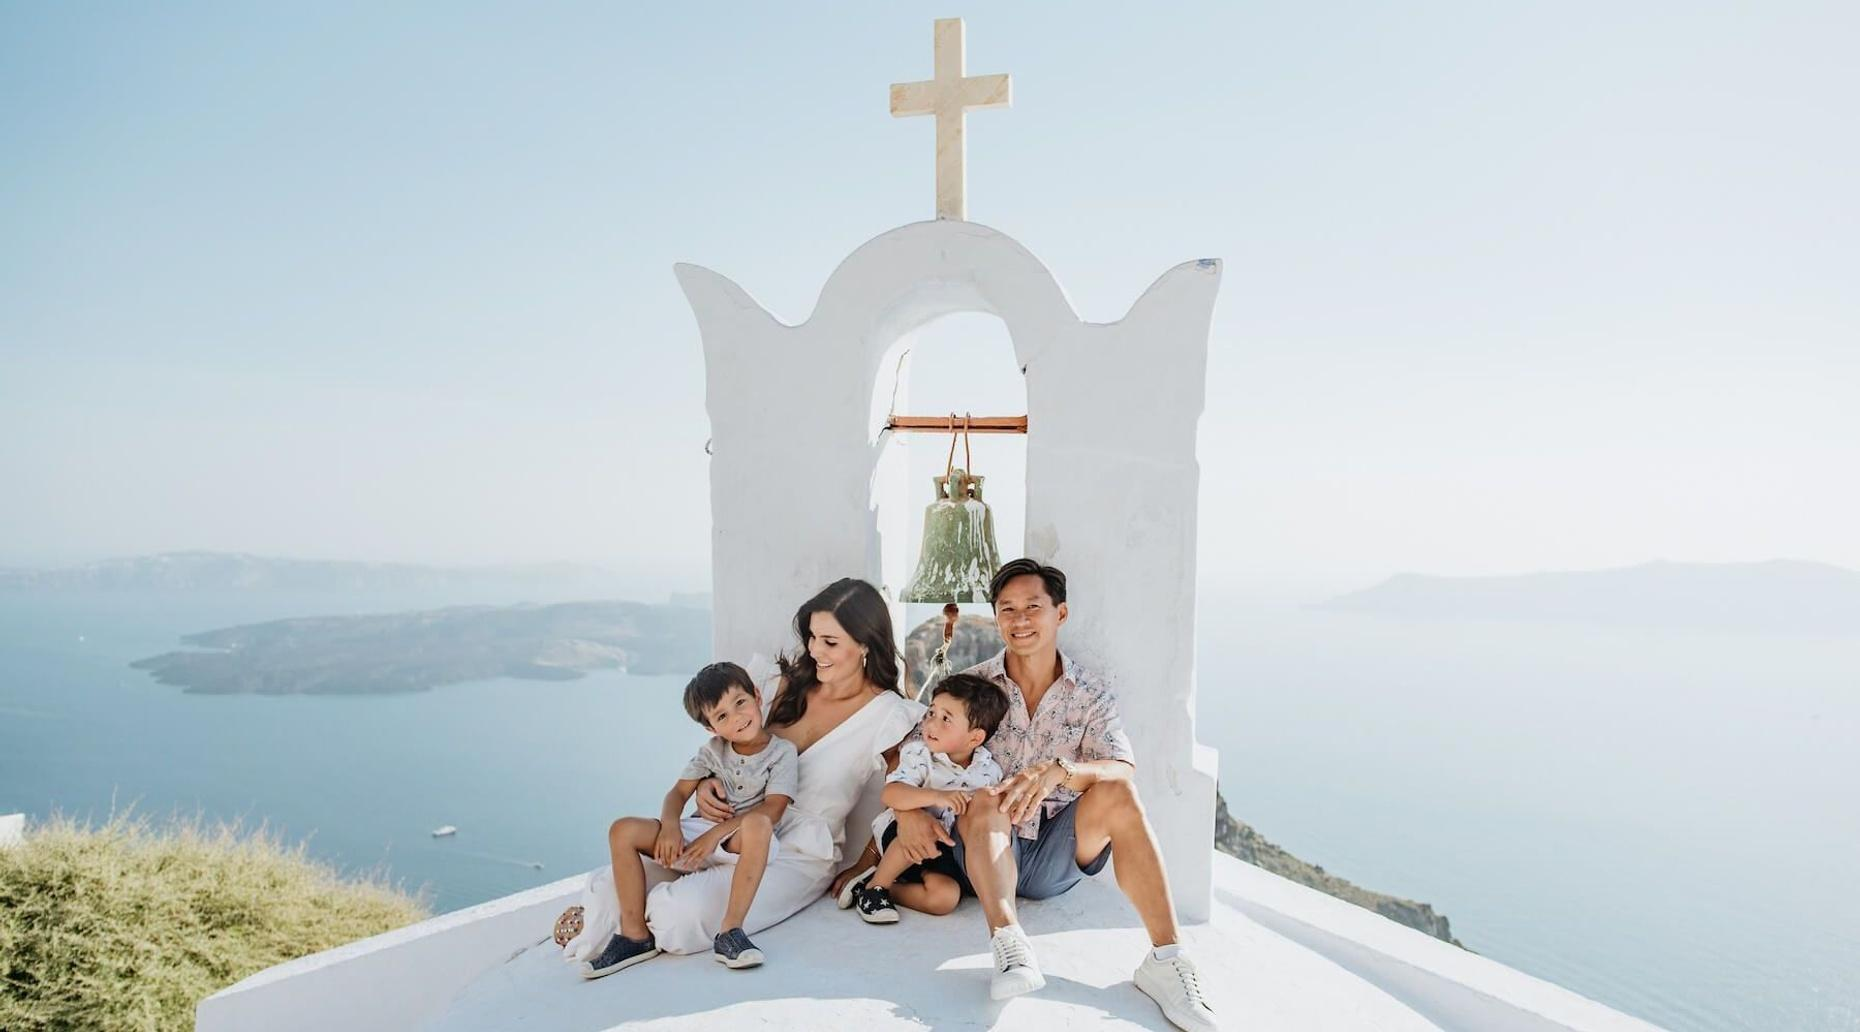 1-Hour Santorini Photo Shoot